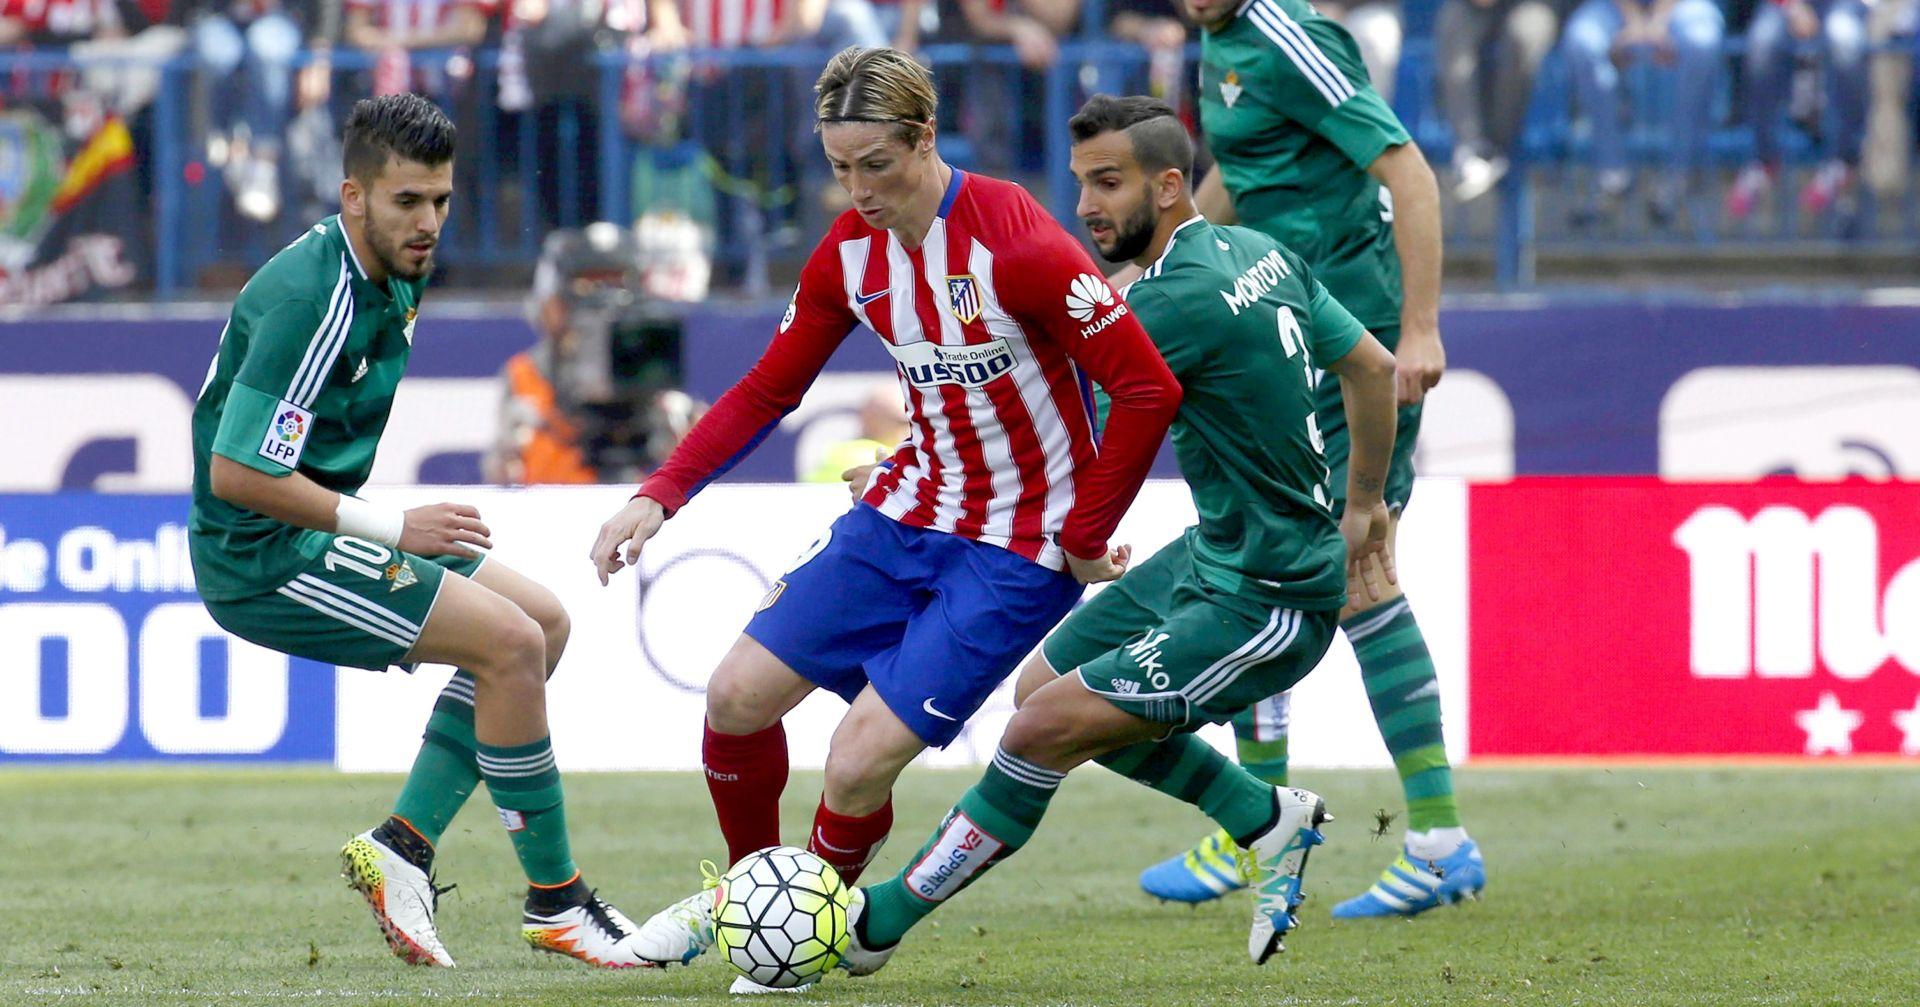 PRIMERA Atletico Betisu zabio pet komada, Griezmann dvostruki strijelac